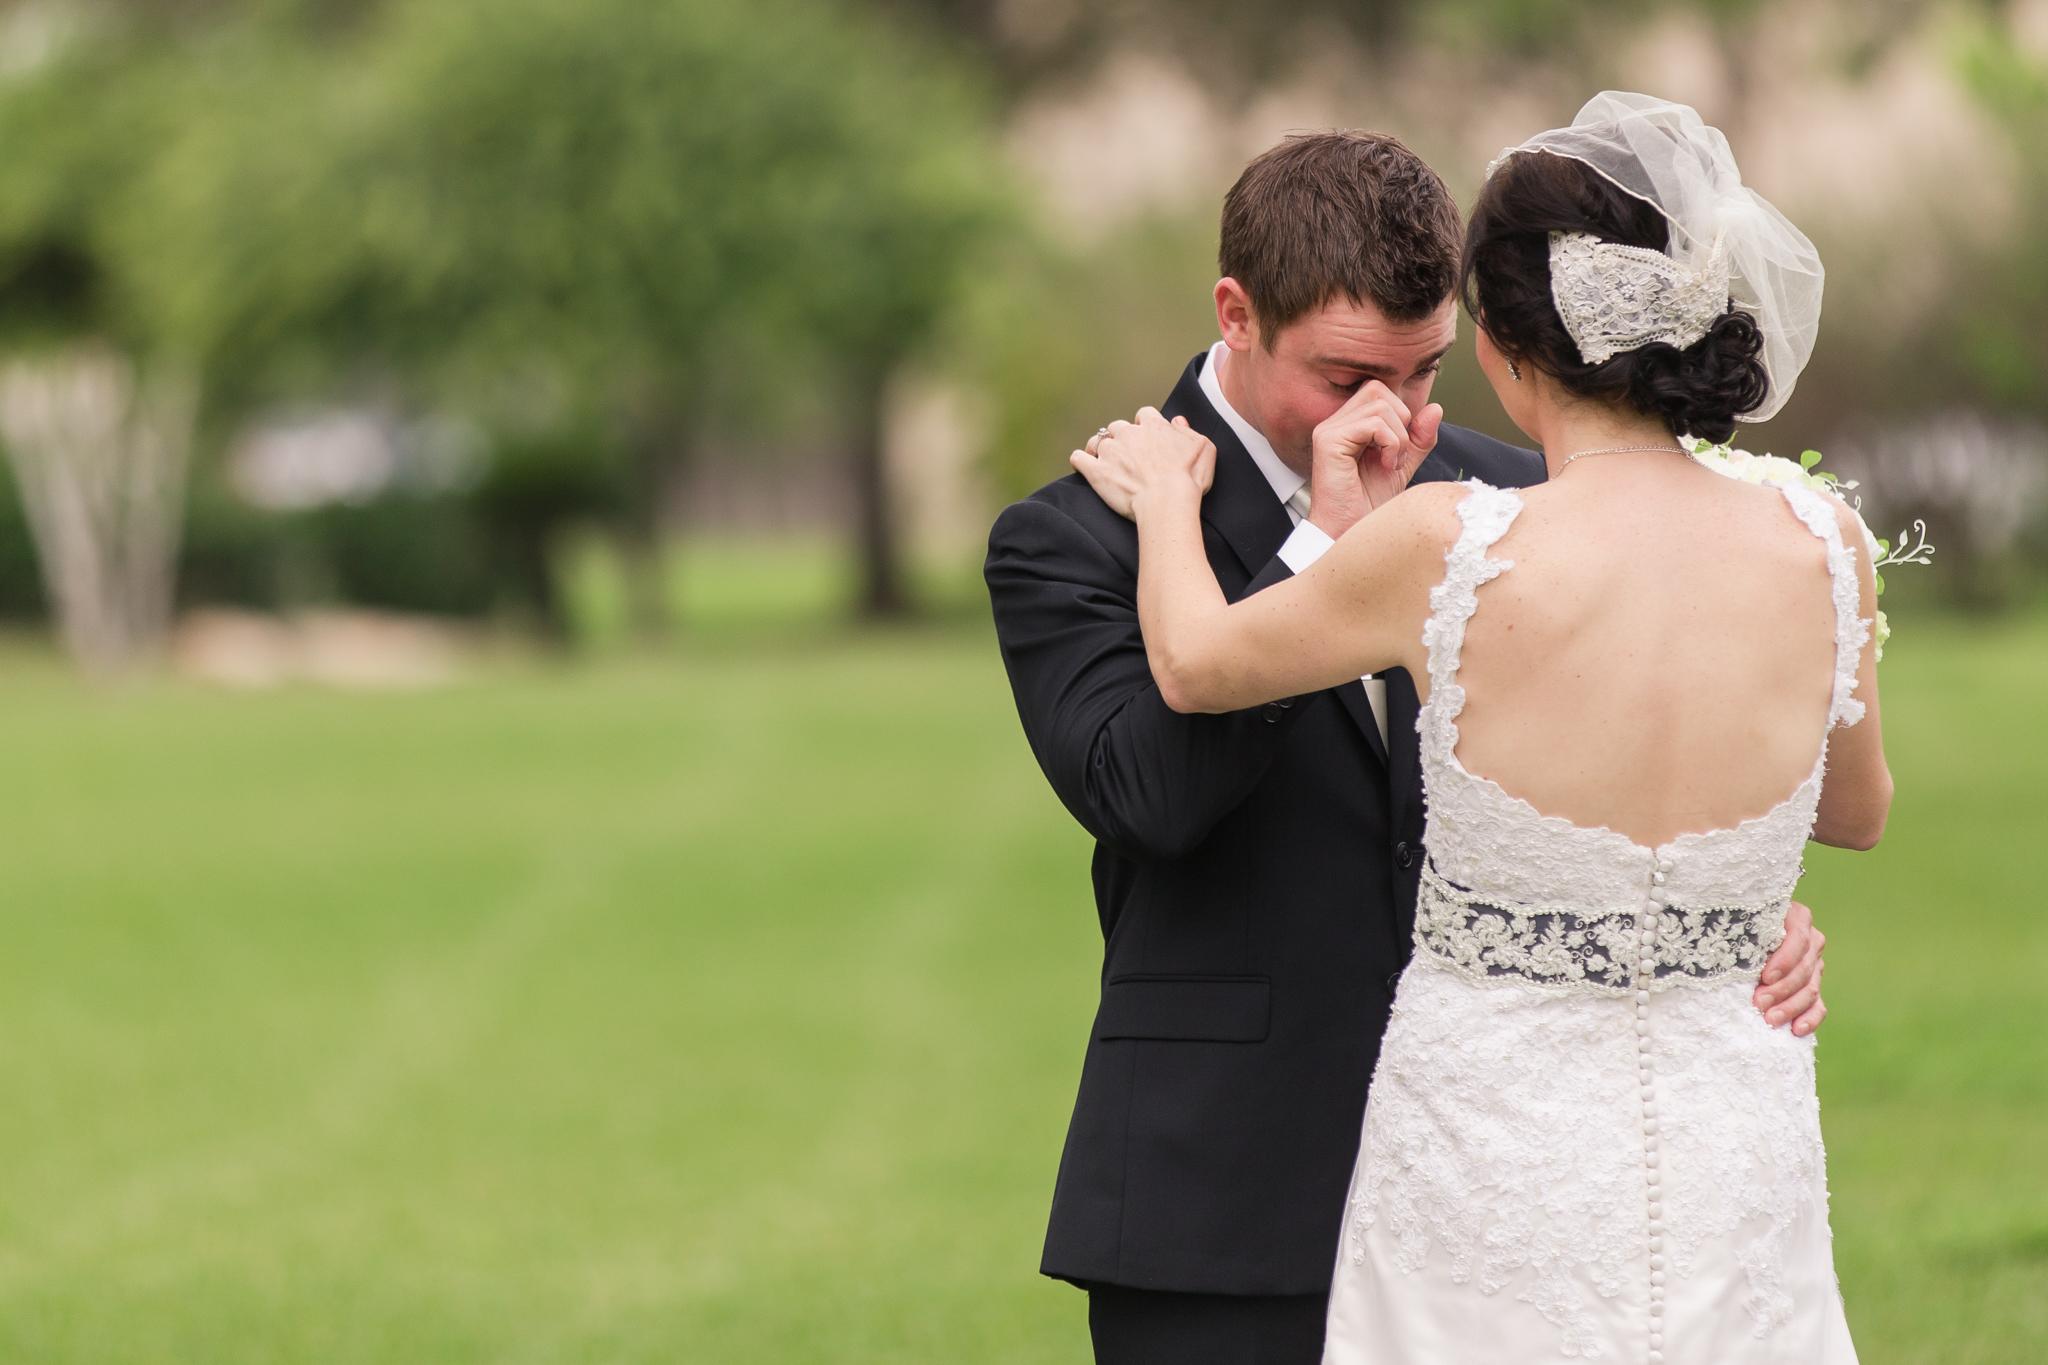 Ashley-Amber-Photo-Outdoor-Wedding-Photography-113836.jpg